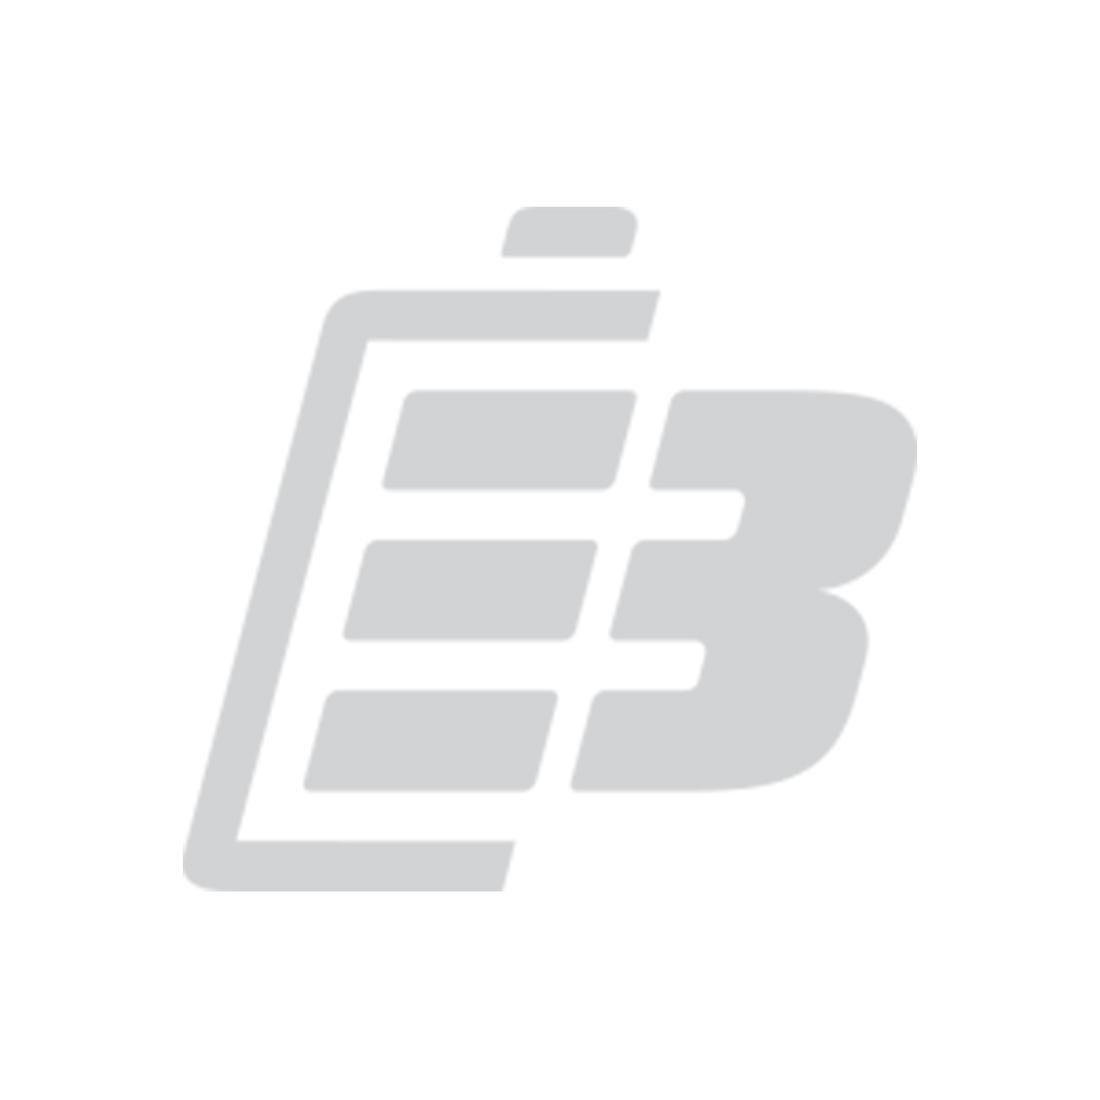 Cordless phone battery Sony BP-T40_1